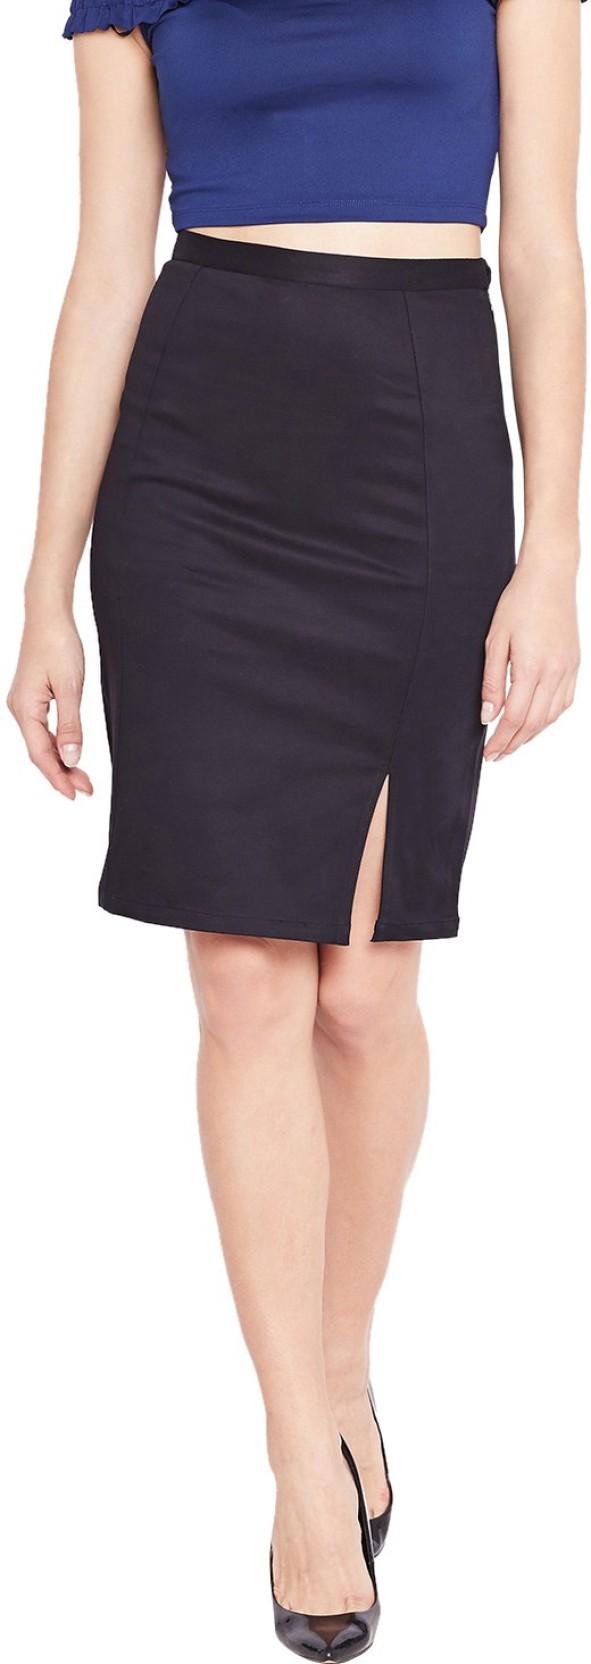 95a06f729 Purplicious Solid Women Pencil Black Skirt - Buy Purplicious Solid ...